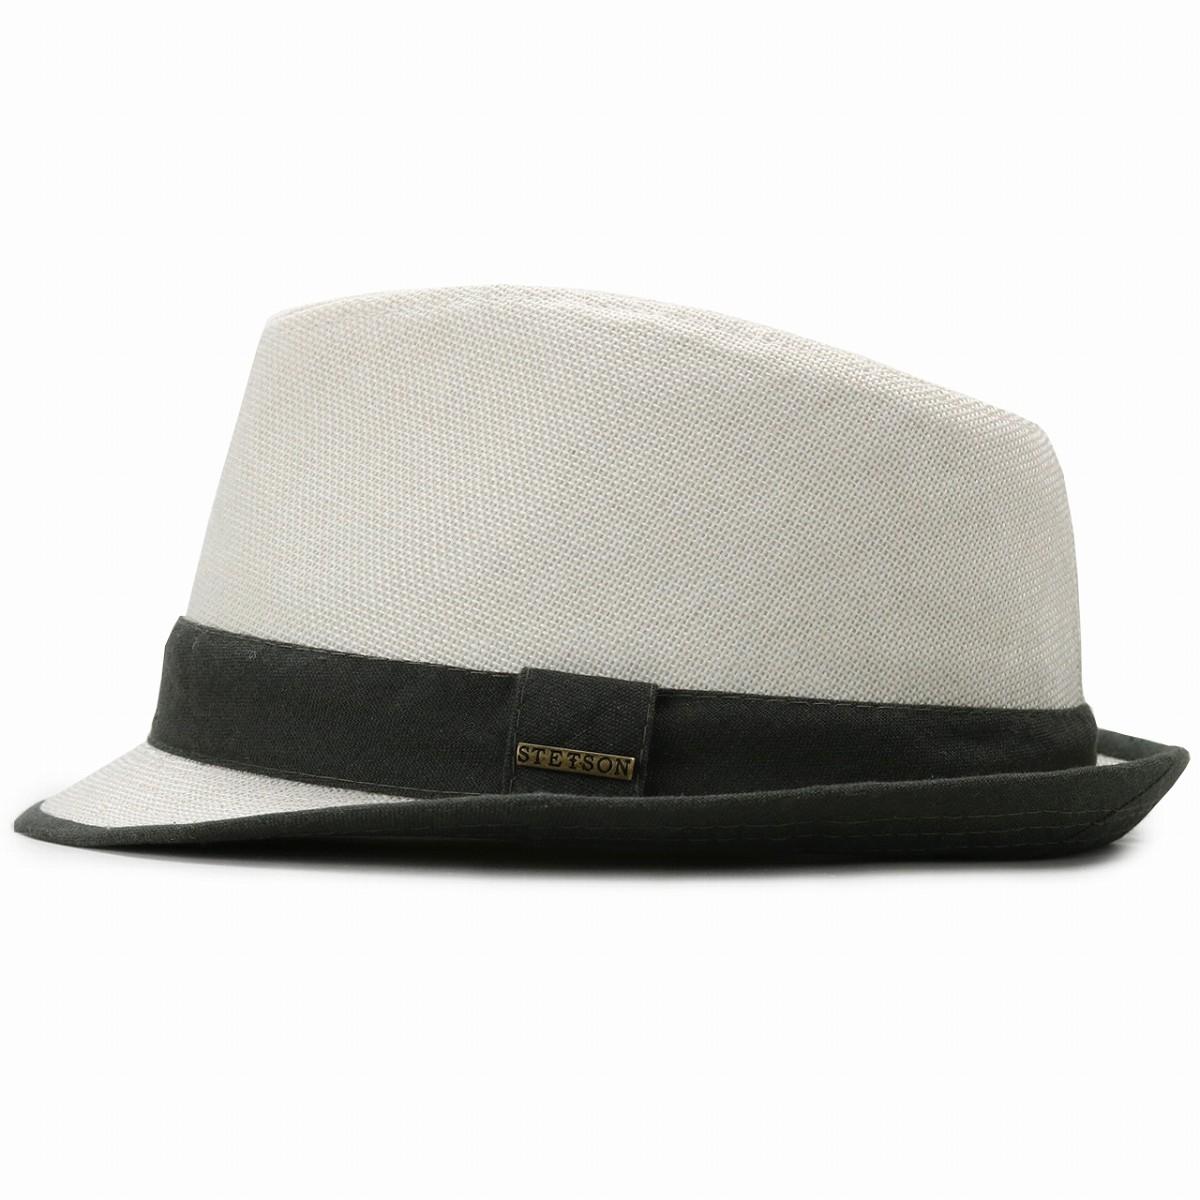 ... stetson hat men Stetson soft felt hat cloth STETSON Cloth Fedora soft  cap ふはく ... 18e9a5b2ebc